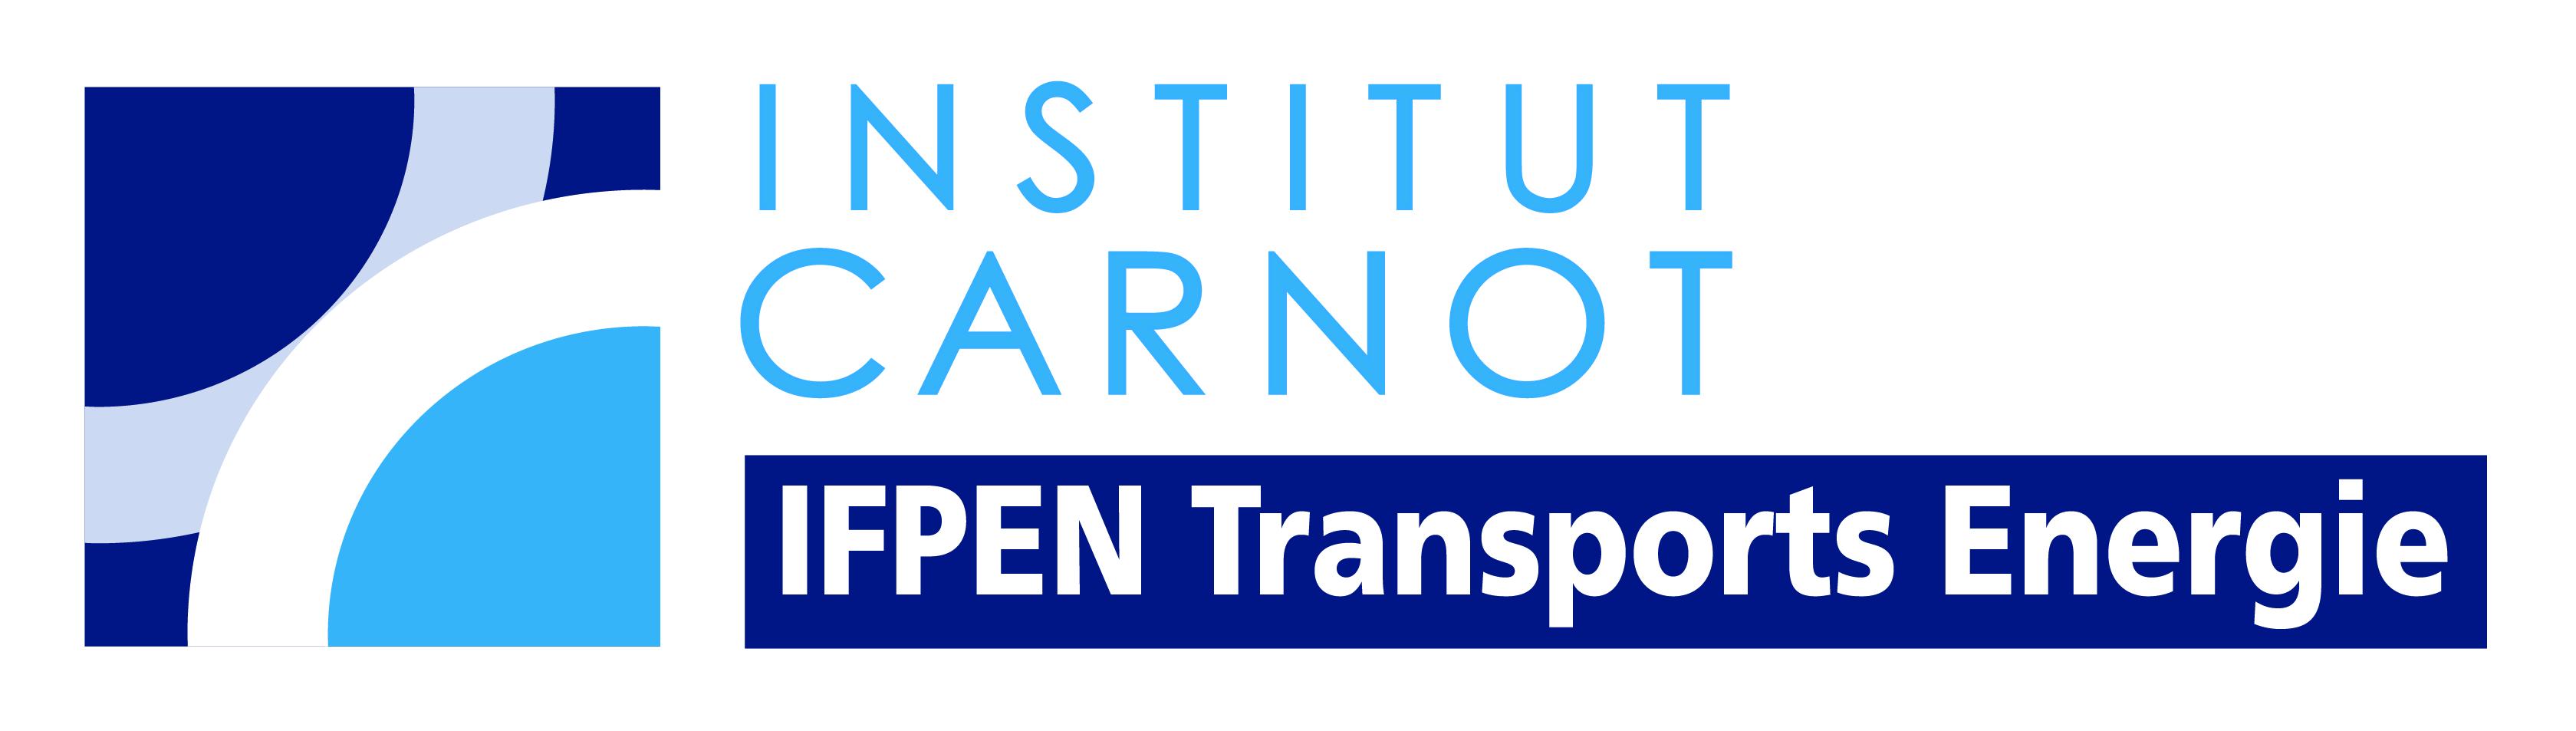 Carnot Institute